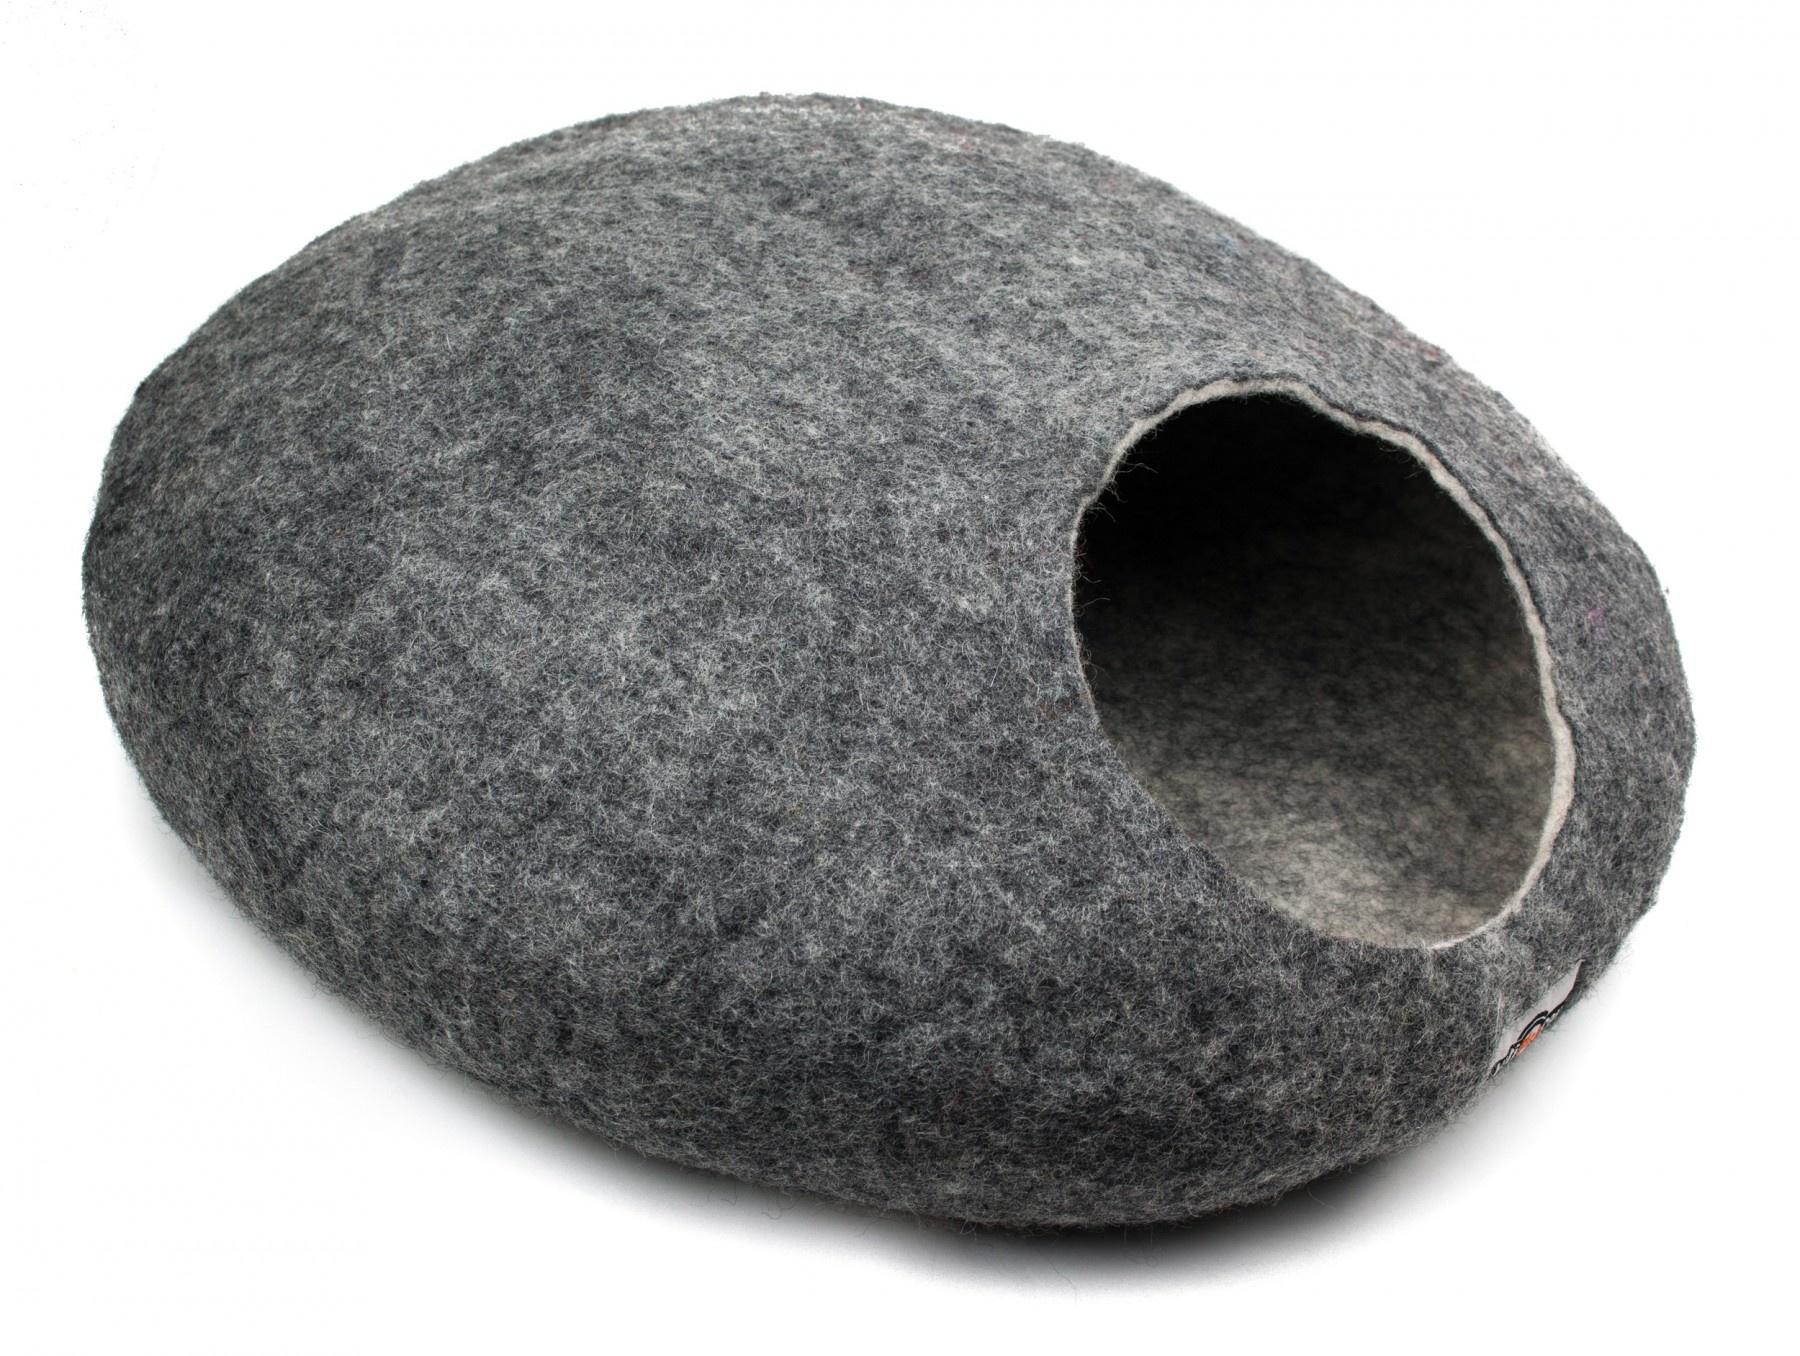 Yeti Yeti Pet Cave Charcoal